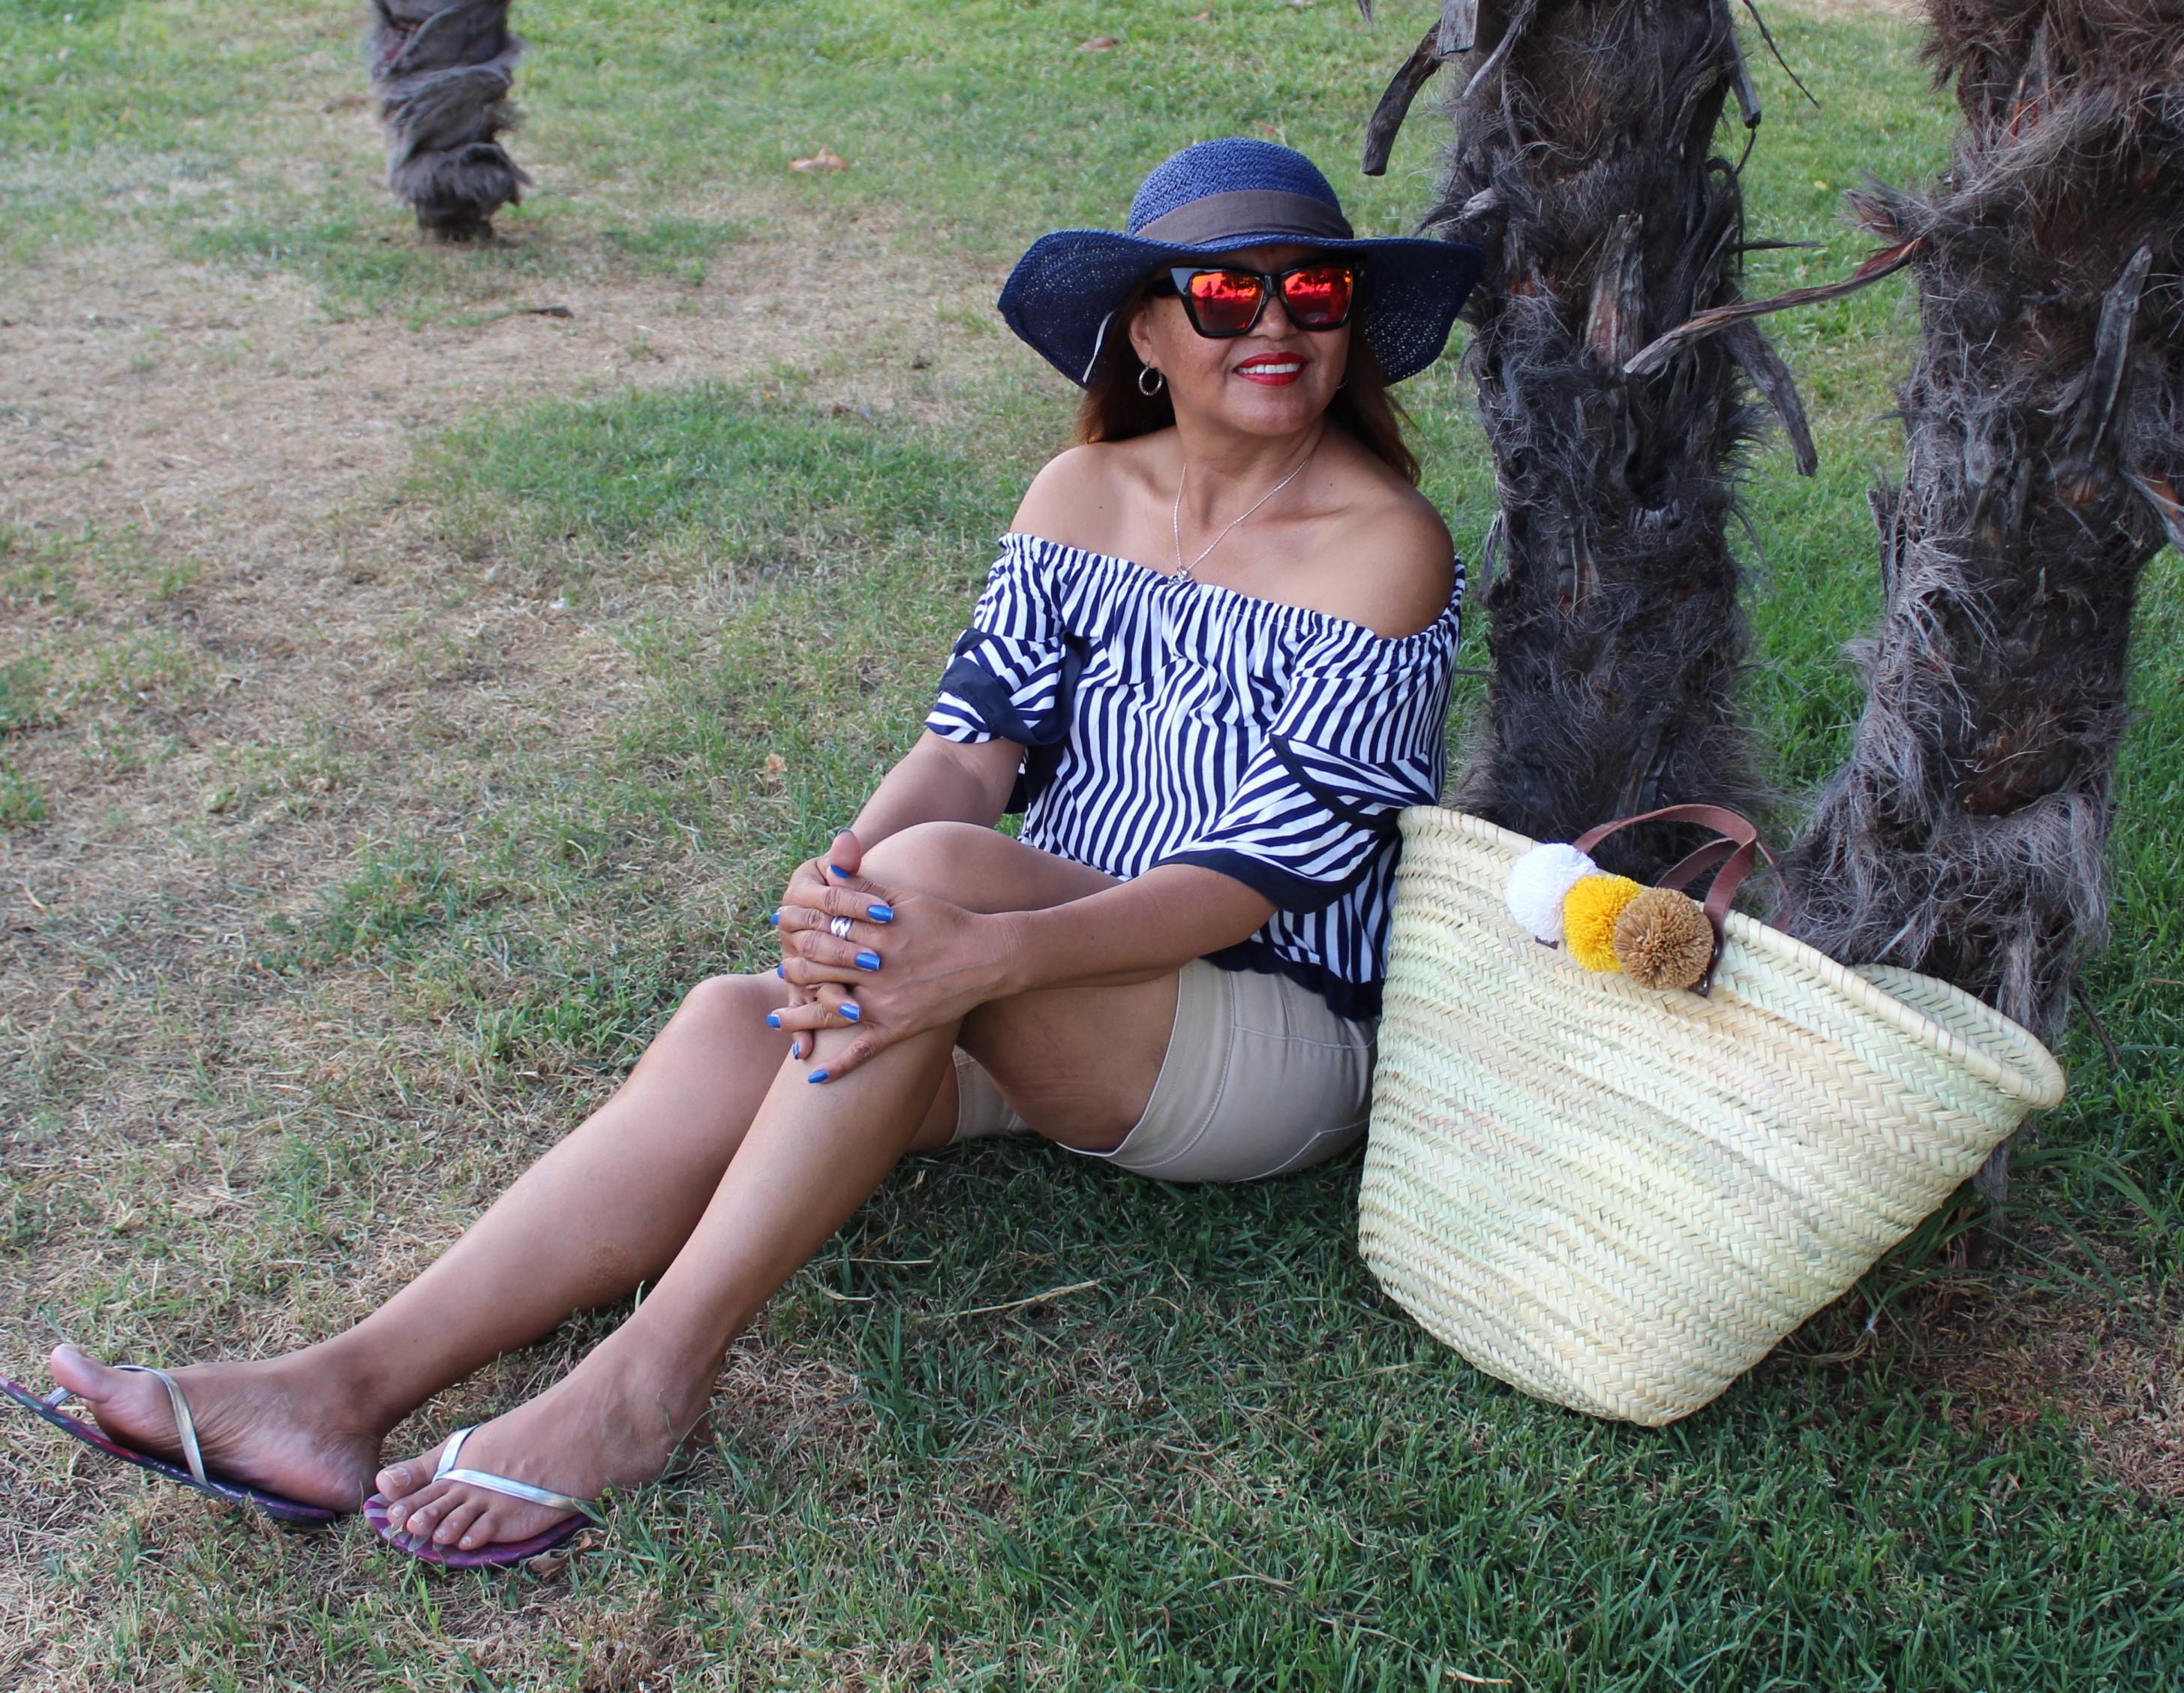 Pamela azul y cesta de rafia